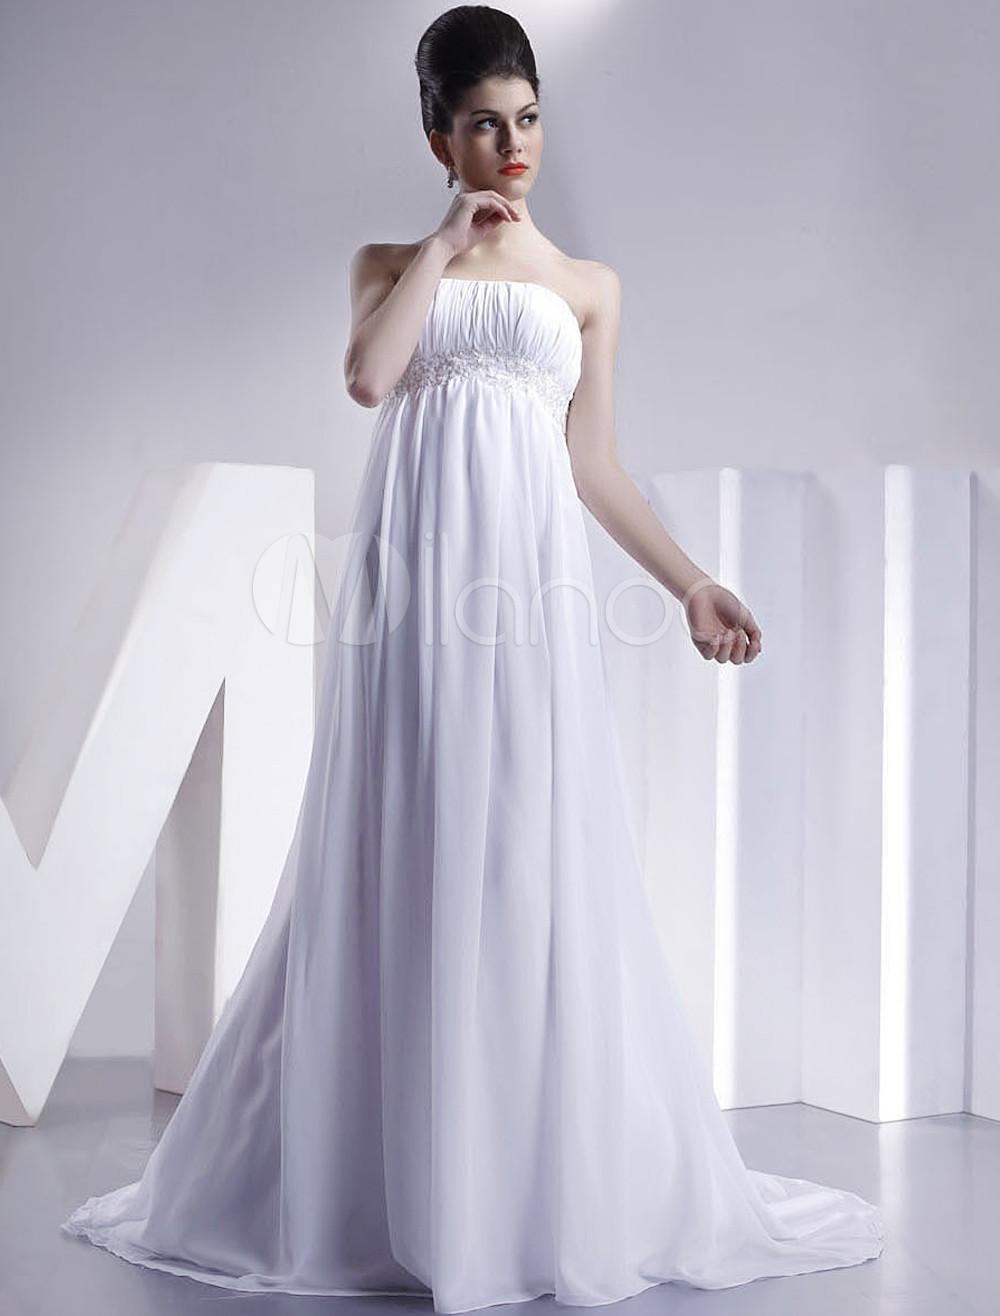 White Empire Waist Sheath Strapless Wedding Dress